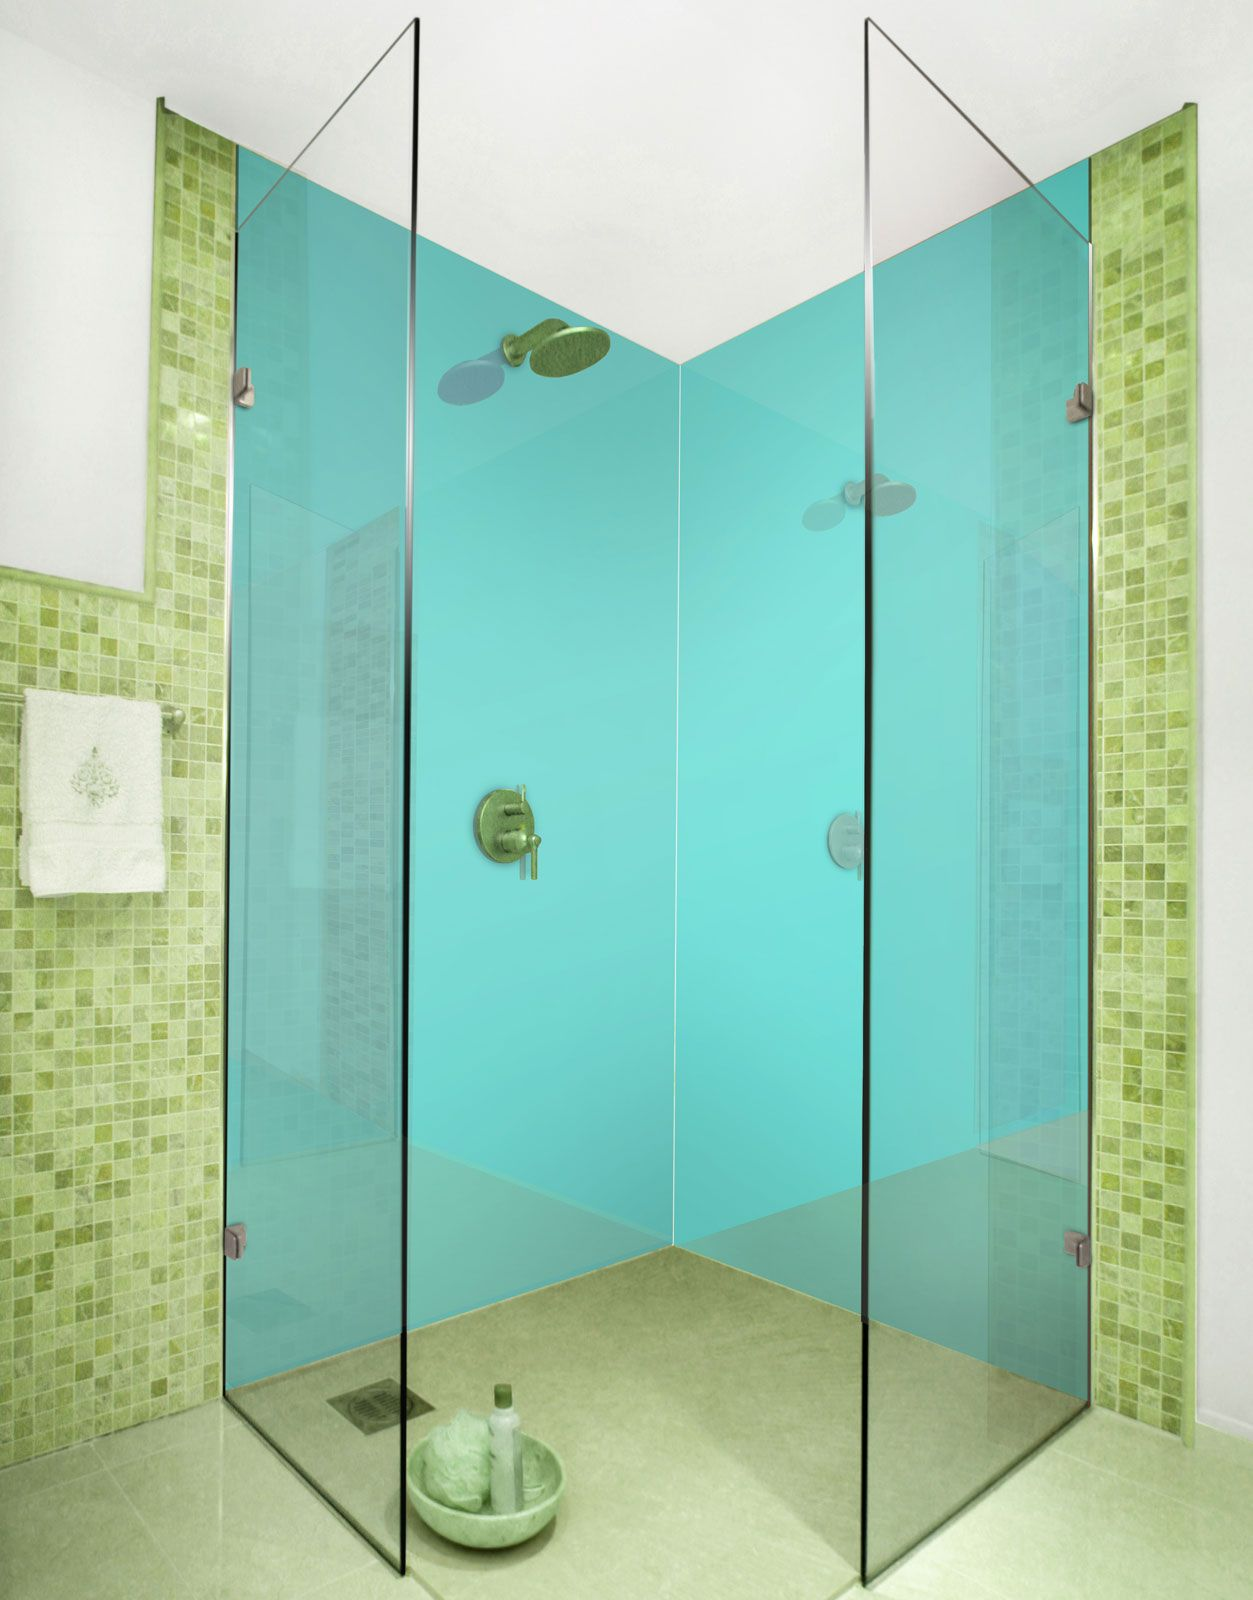 Aqua Aquamarine Coloured Acrylic Shower Wall Panels Shower Wall Shower Panels Corian Shower Walls